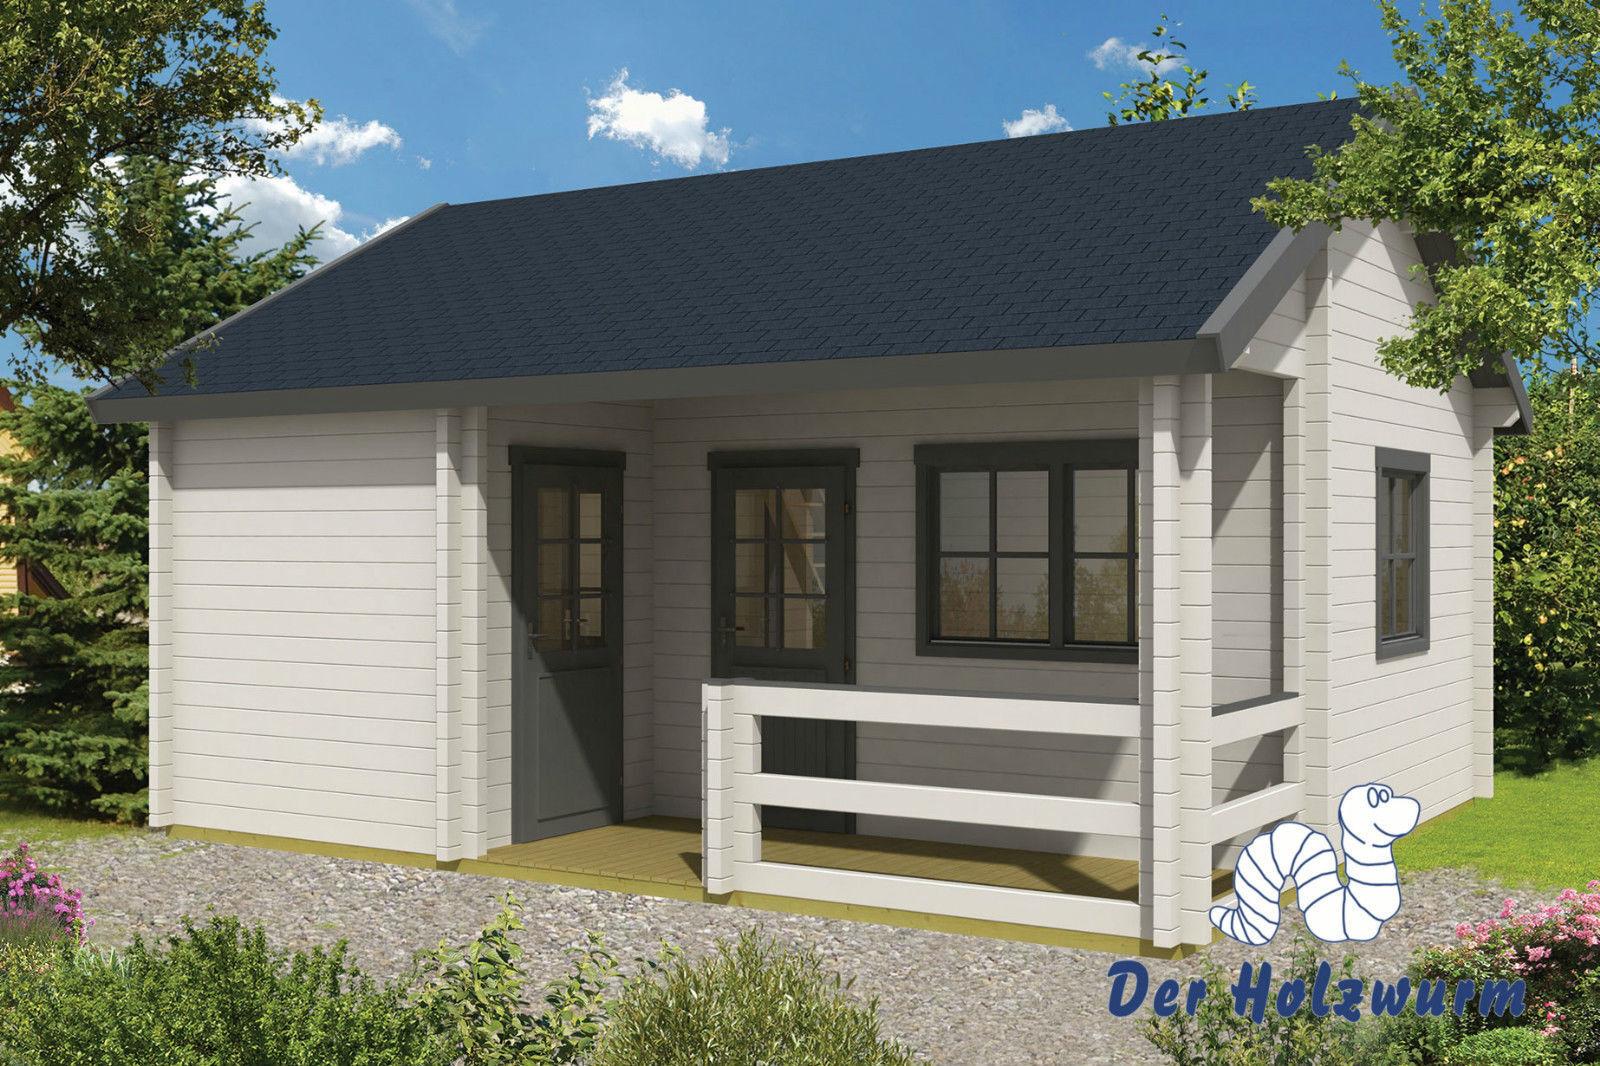 70 mm gartenhaus 600x510cm blockhaus ferienhaus holzhaus holz h tte b ro eur. Black Bedroom Furniture Sets. Home Design Ideas